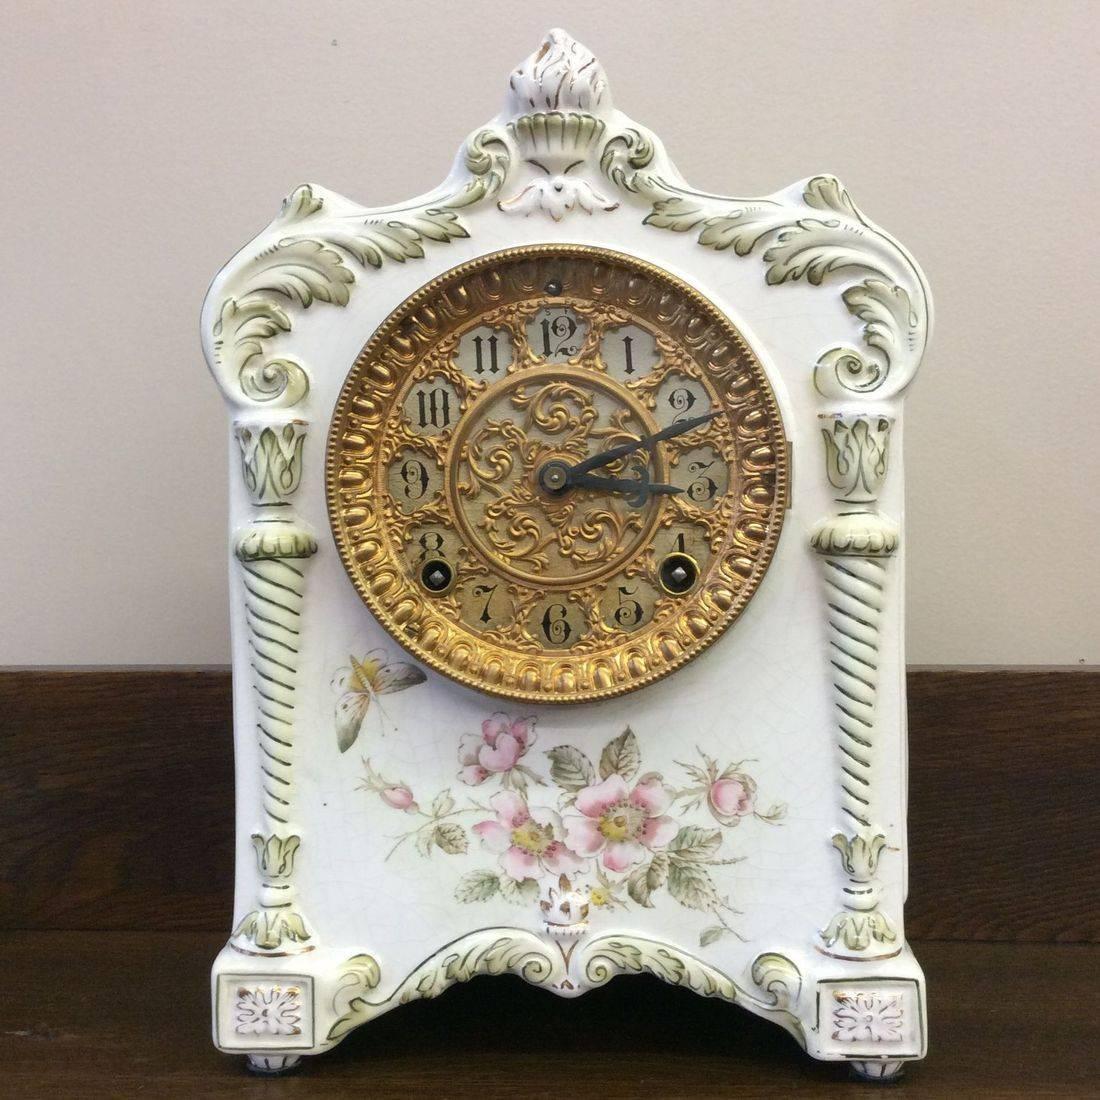 "Pat. June 18, 1882 Ansonia Clock Co.  "" Working "" Porcelain Mantle Clock  8-1/2"" x 5"" x 12""H. Excellent Condition   $300.00"